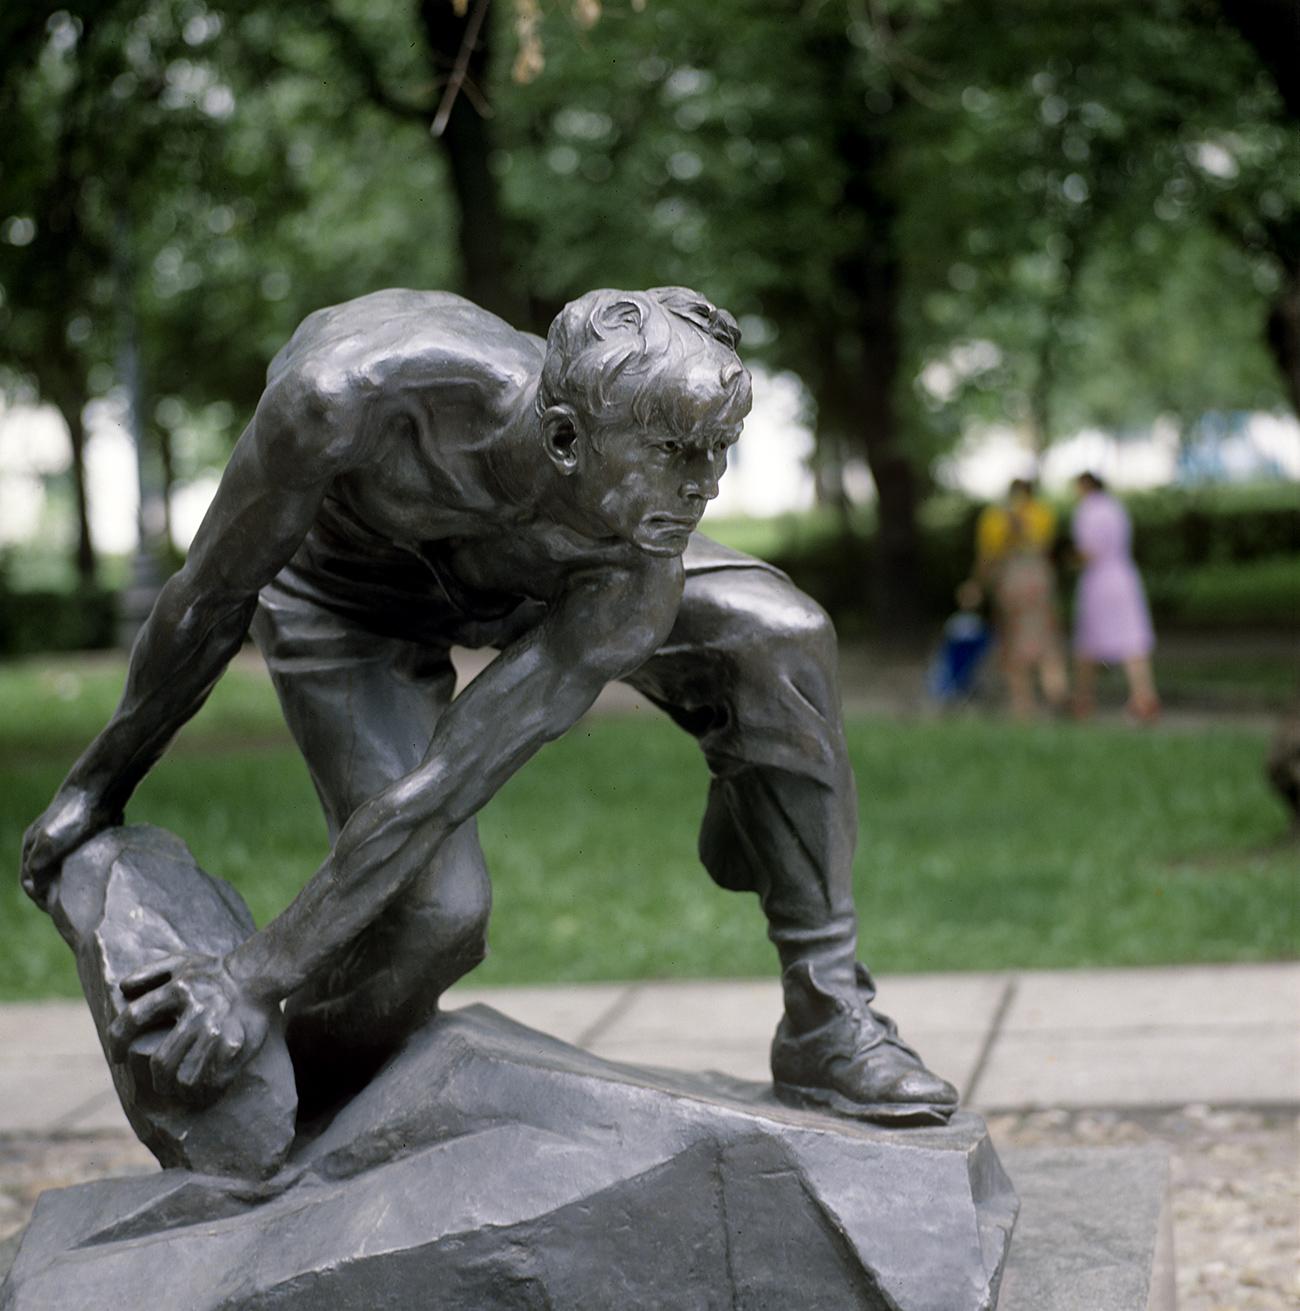 "Statue ""Stone as a weapon of the proletariat"". Built in 1967. Sculptor - Ivan Shadr, architect - Mikhail Kazarnovsky. Source: Ivanov/RIA Novosti"